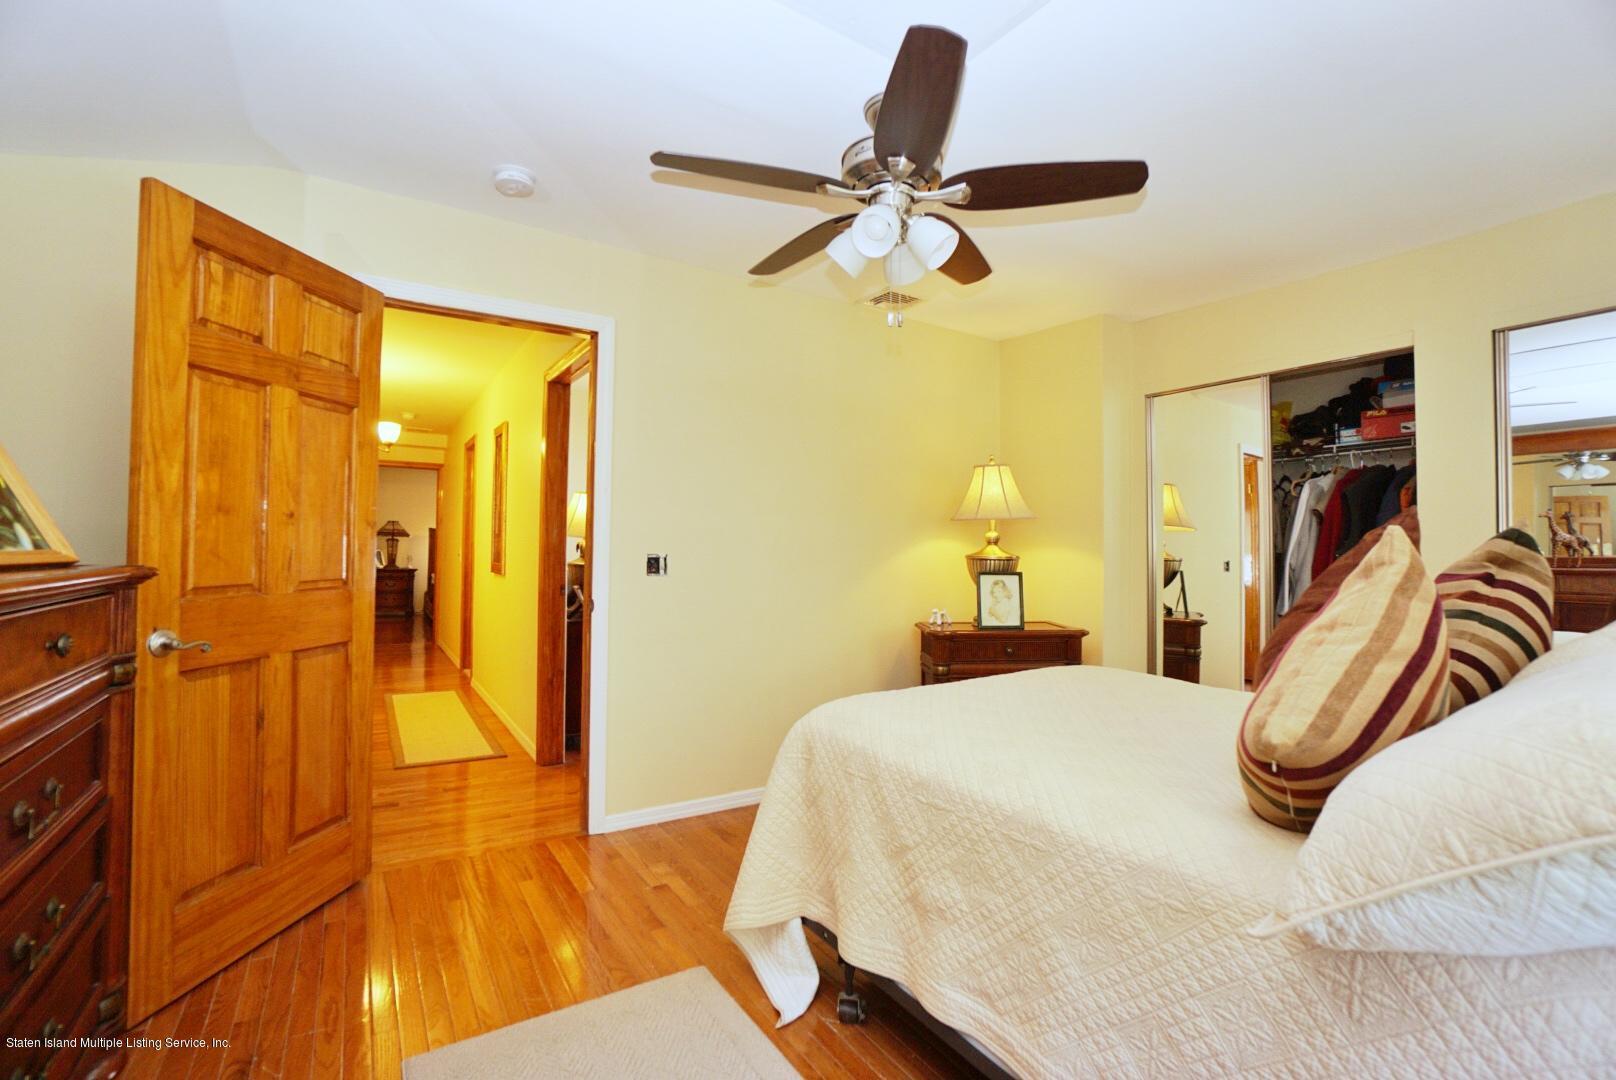 Single Family - Semi-Attached 47 Ilyse Court   Staten Island, NY 10306, MLS-1141335-20